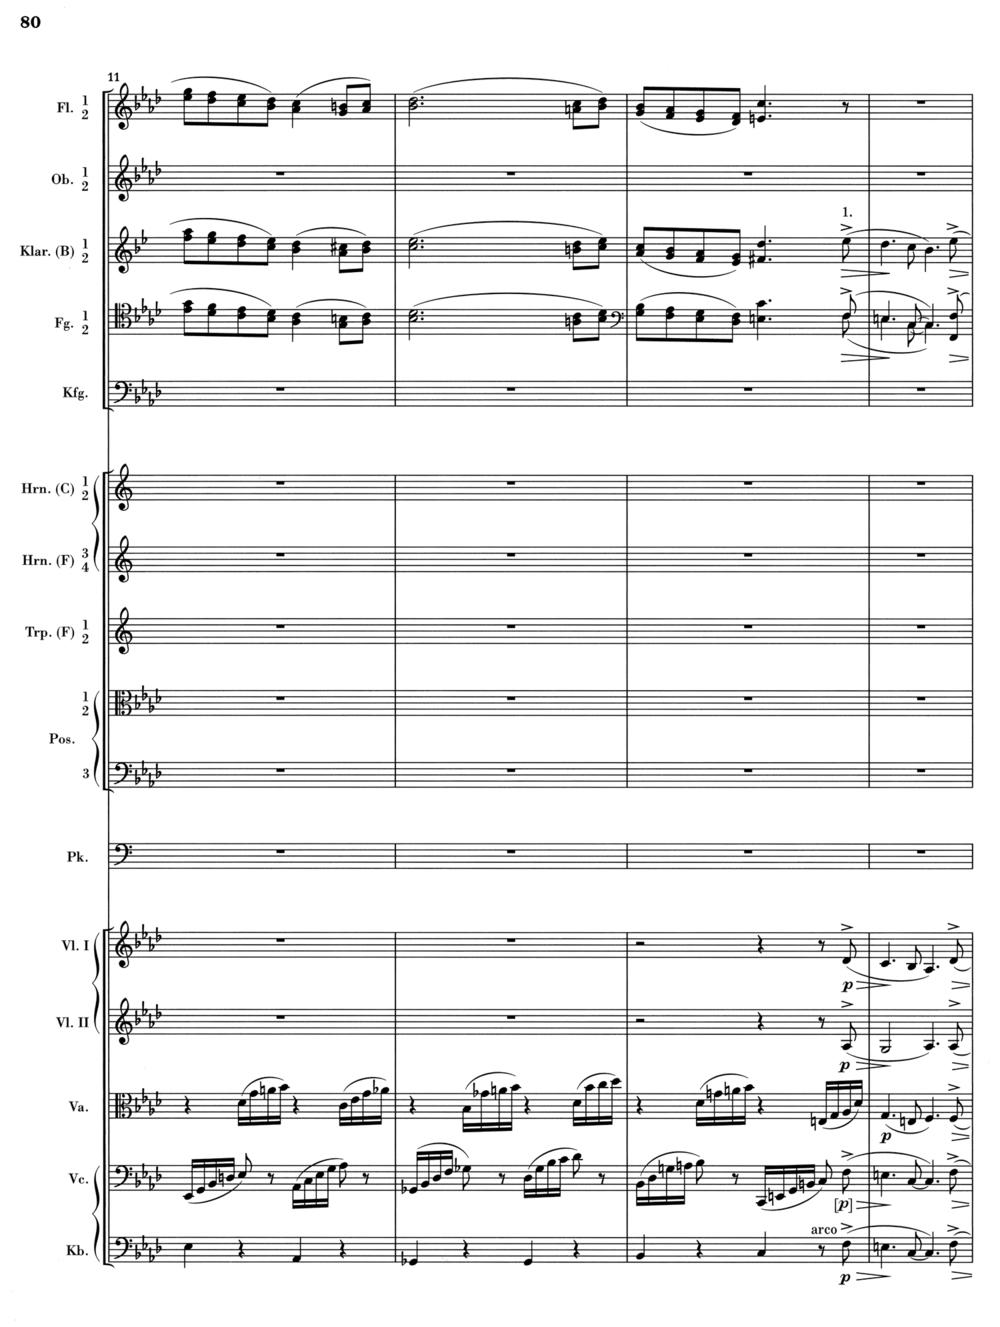 Brahms 3 Score 9.jpg